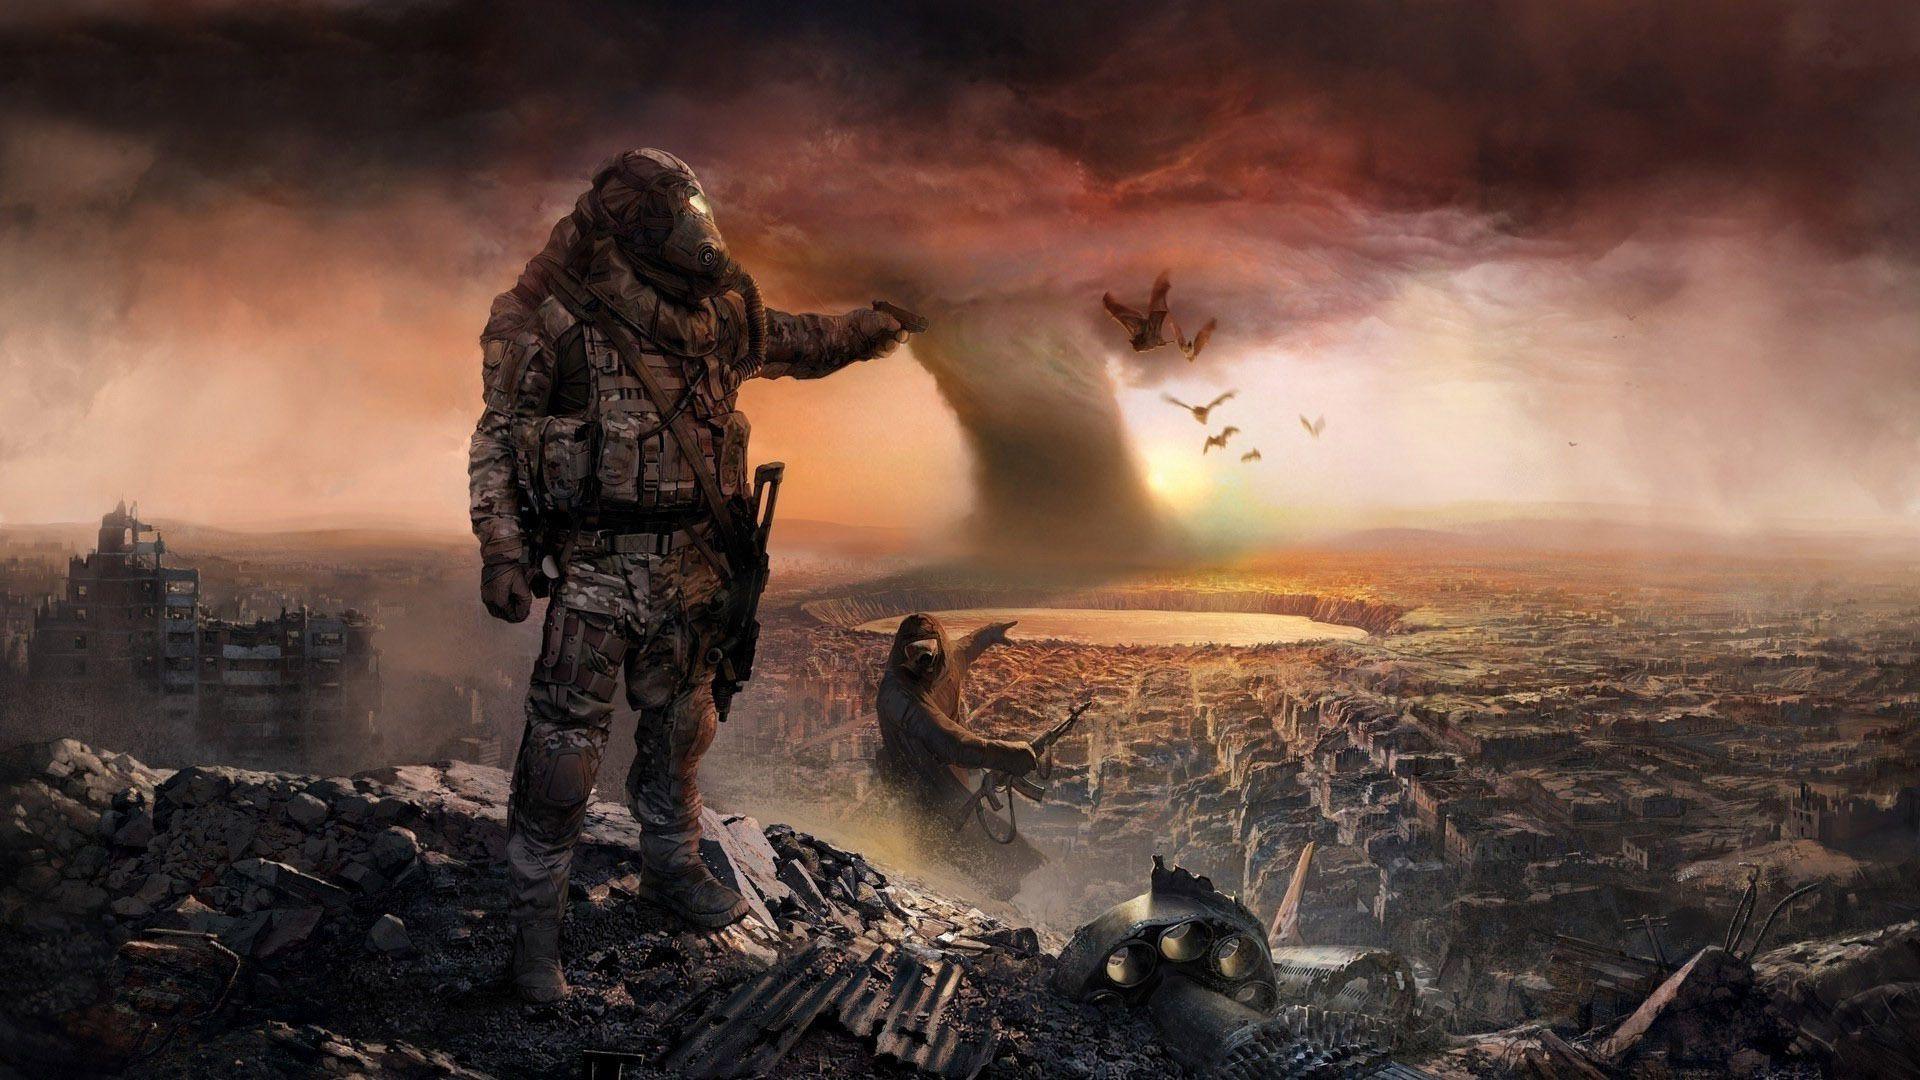 Post Apocalyptic City Wallpaper Post Apocalyptic City Apocalypse Art Post Apocalyptic Art